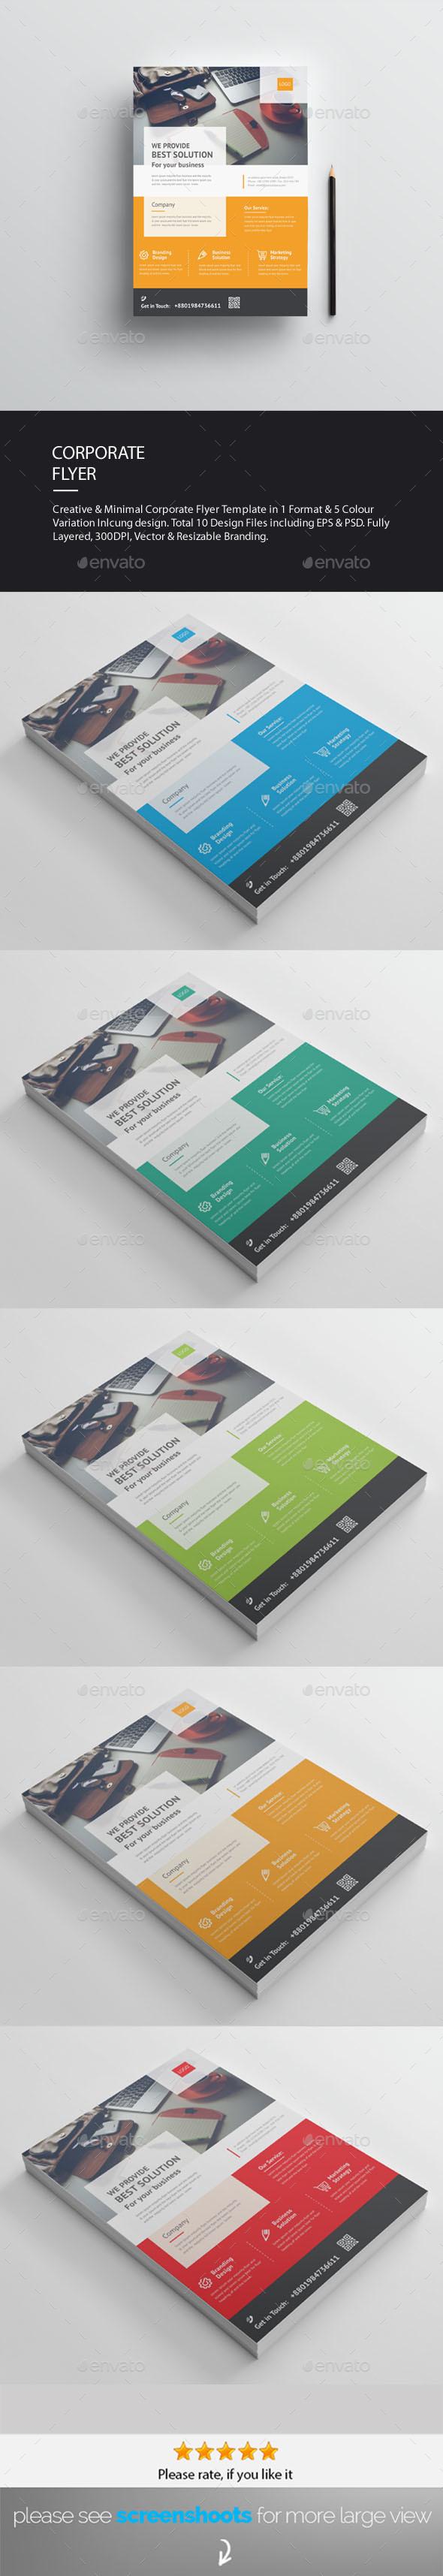 GraphicRiver Corporate Flyer AD Template 20408064